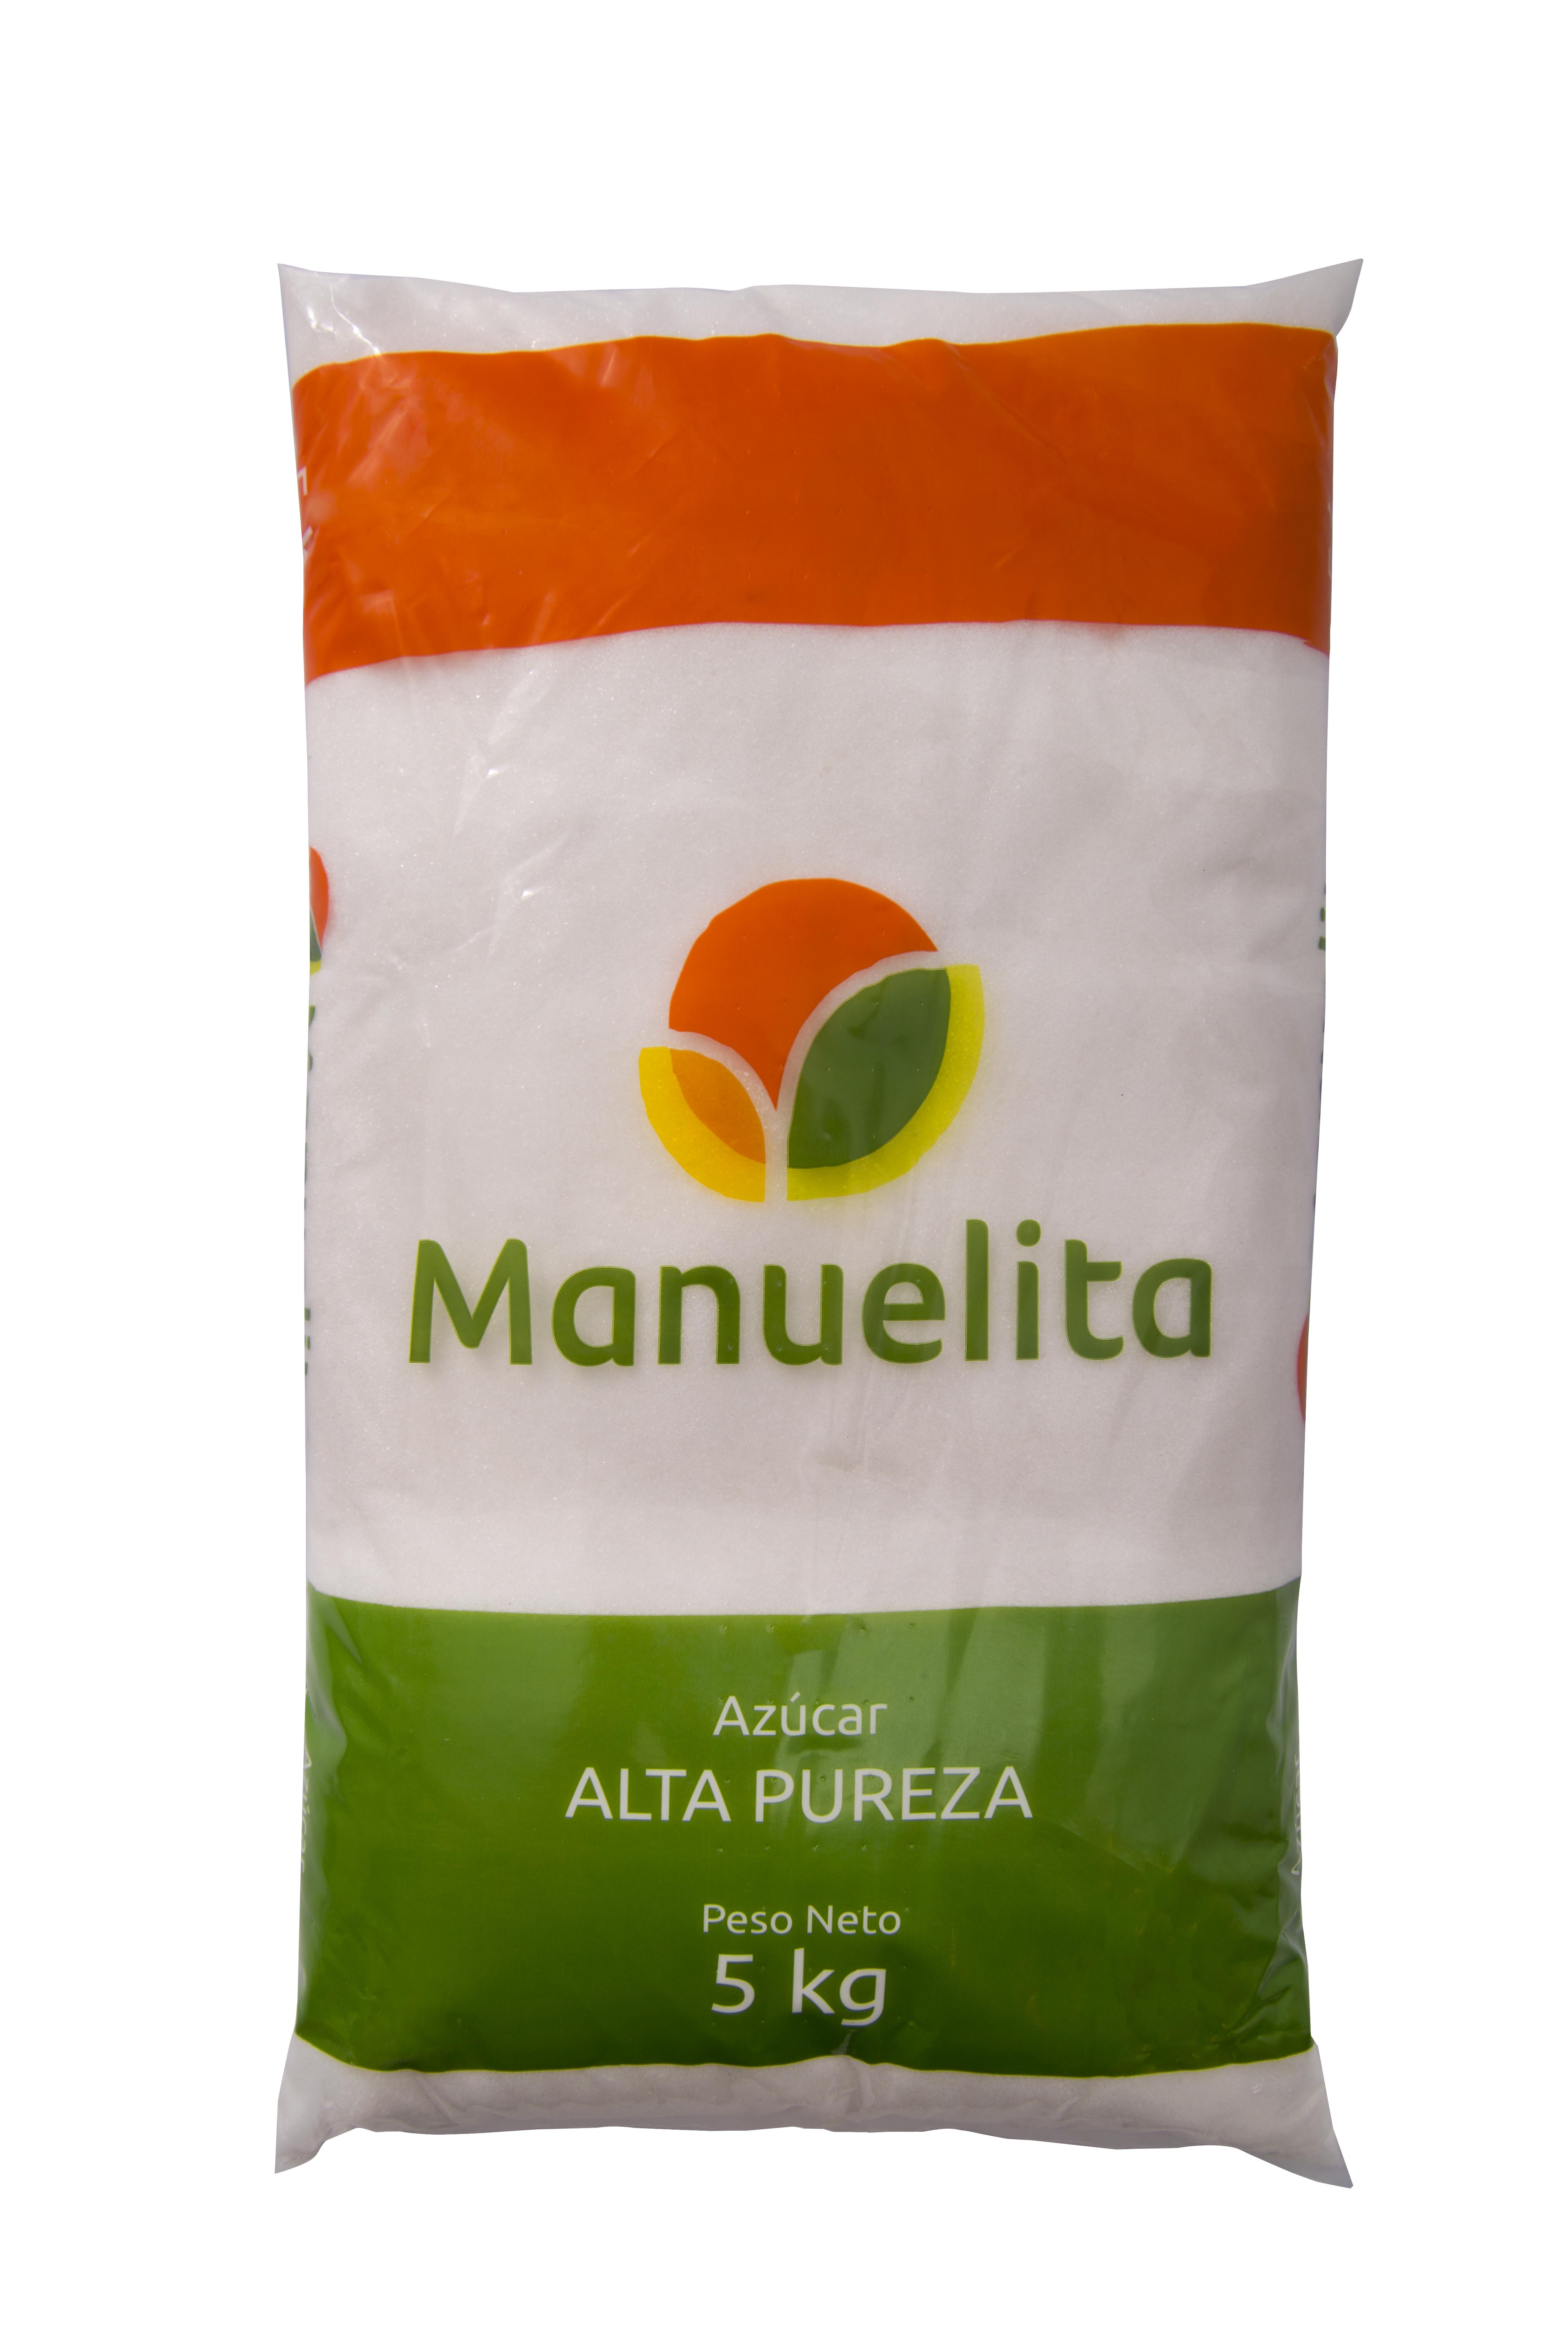 Azucar Manuelita 5k